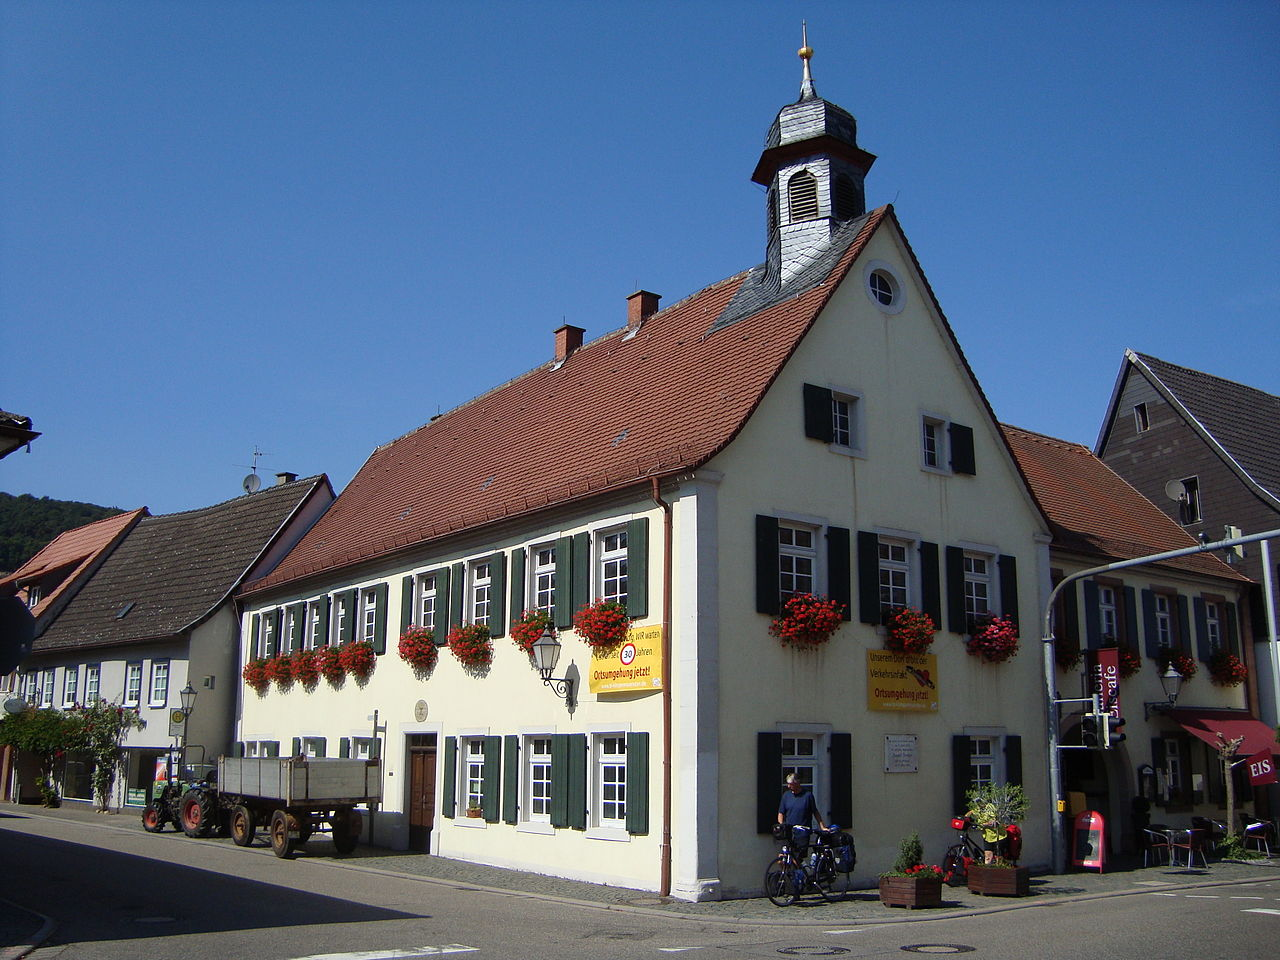 Bild August Becker Museum Klingenmünster